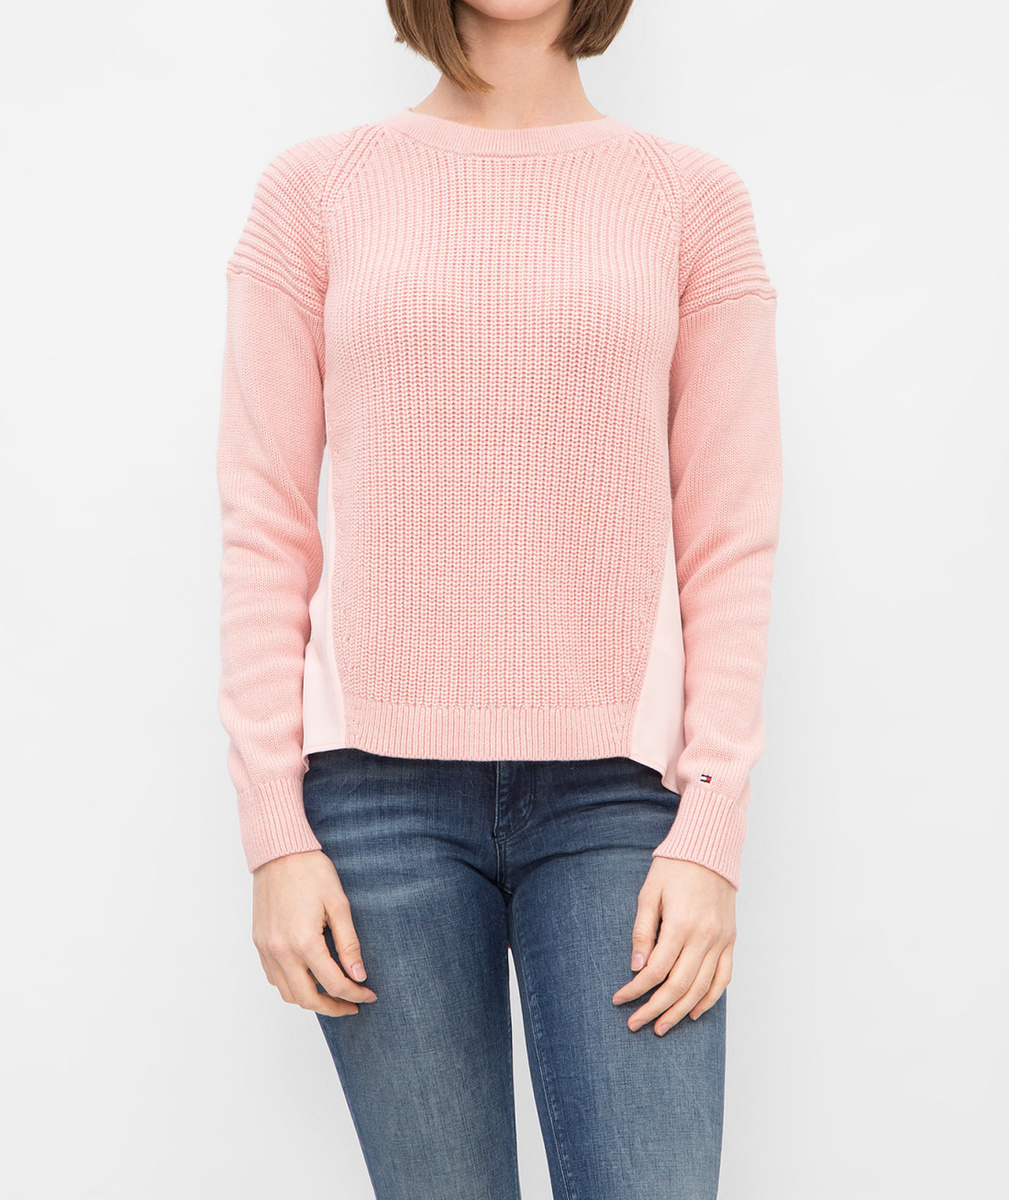 6d918b2e63 Tommy Hilfiger dámský růžový svetr - Mode.cz